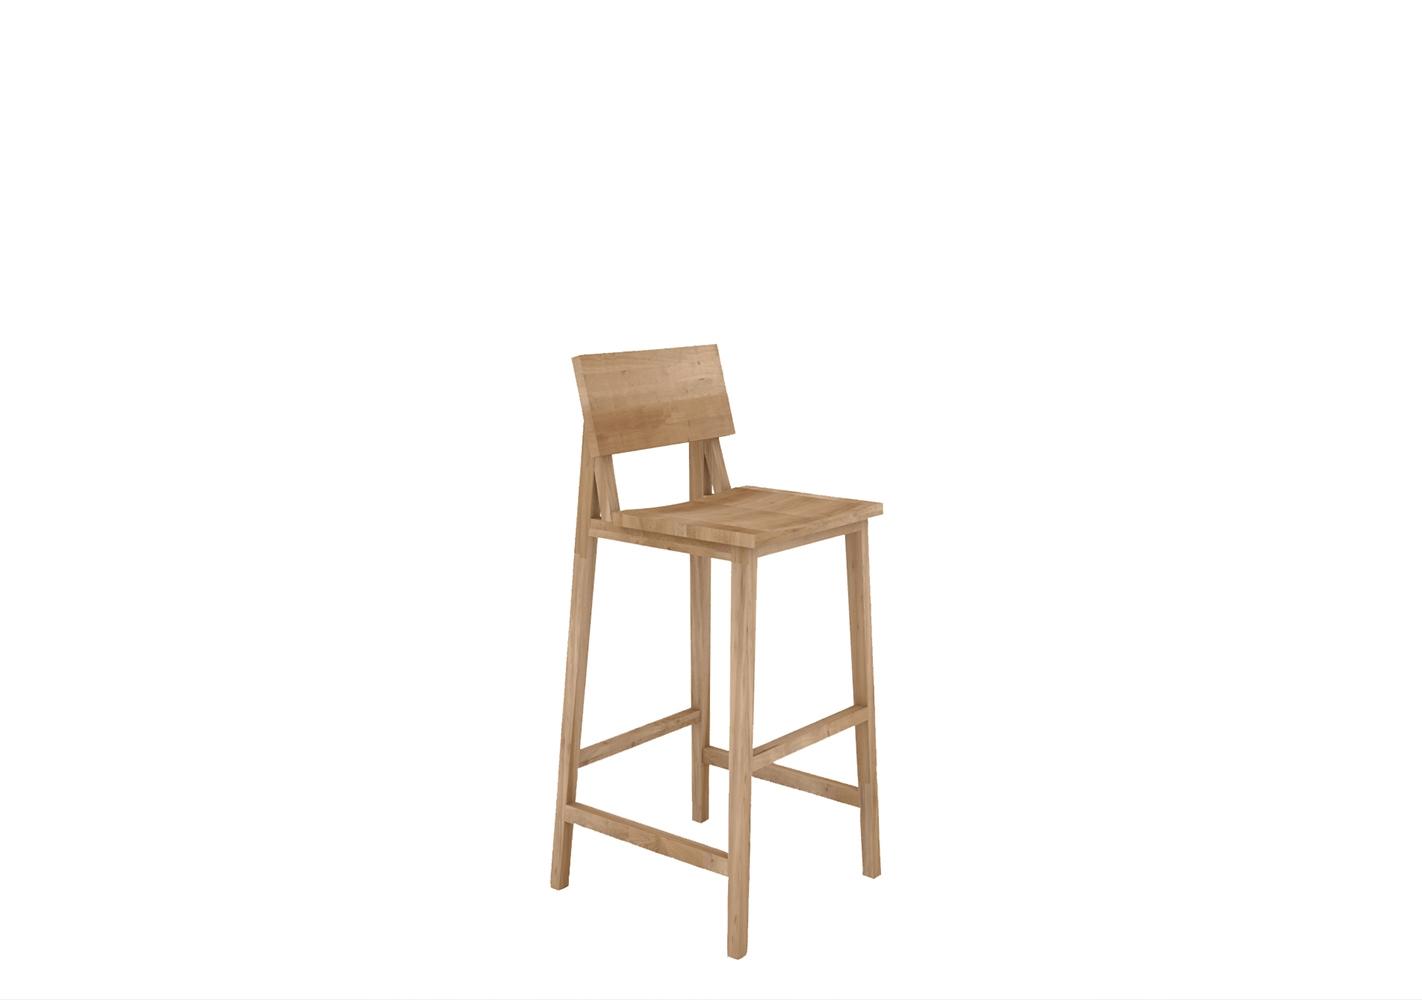 Chaise haute N4 en chêne - ETHNICRAFT